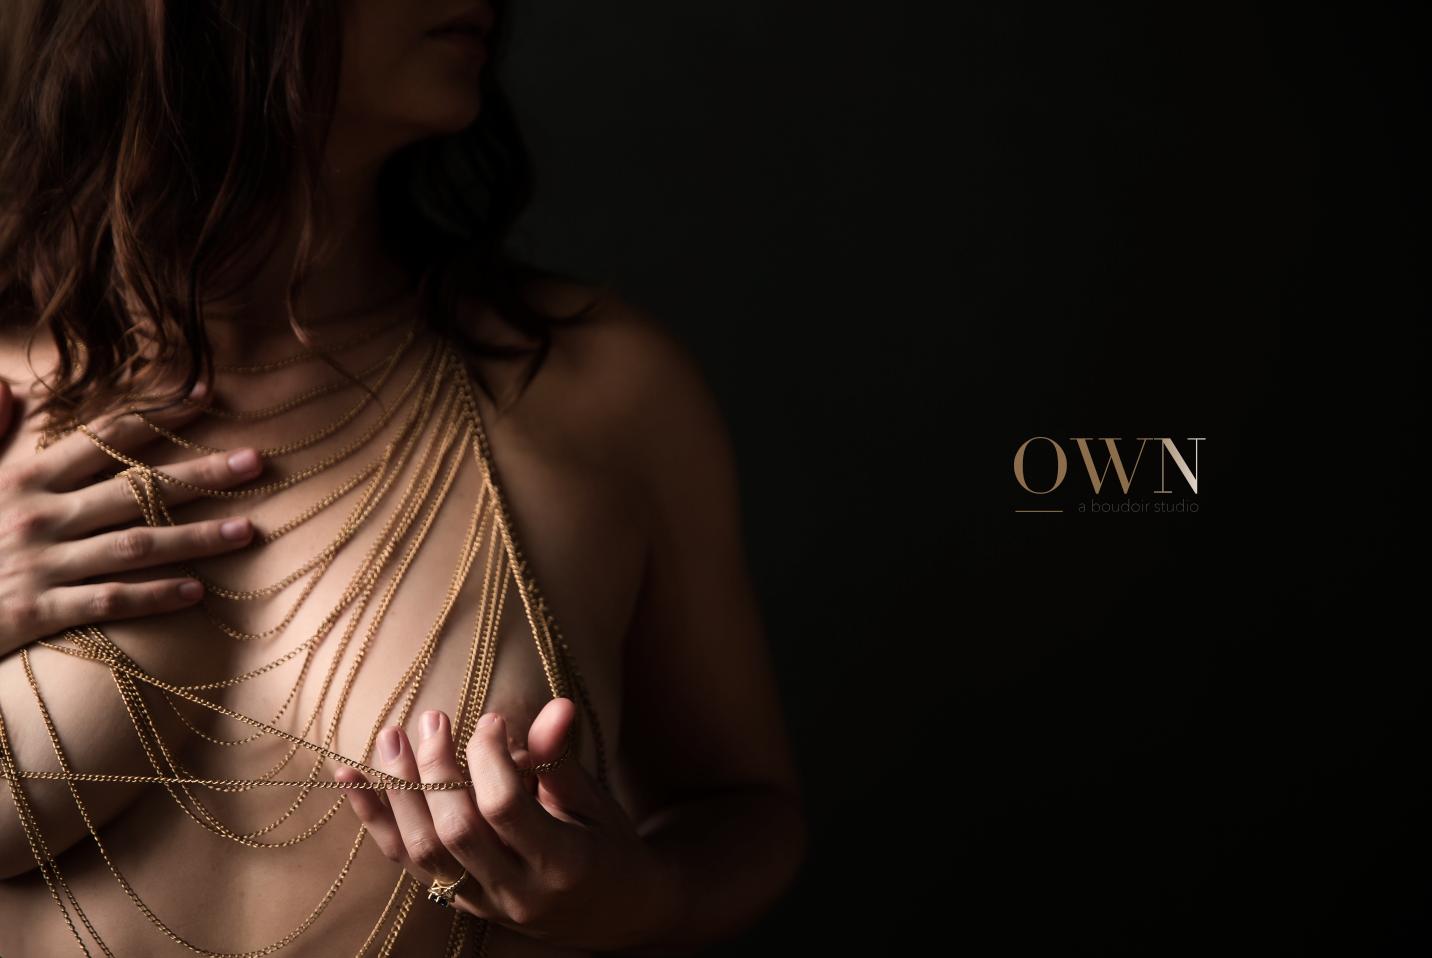 own boudoir, body chain, atlanta boudoir photography